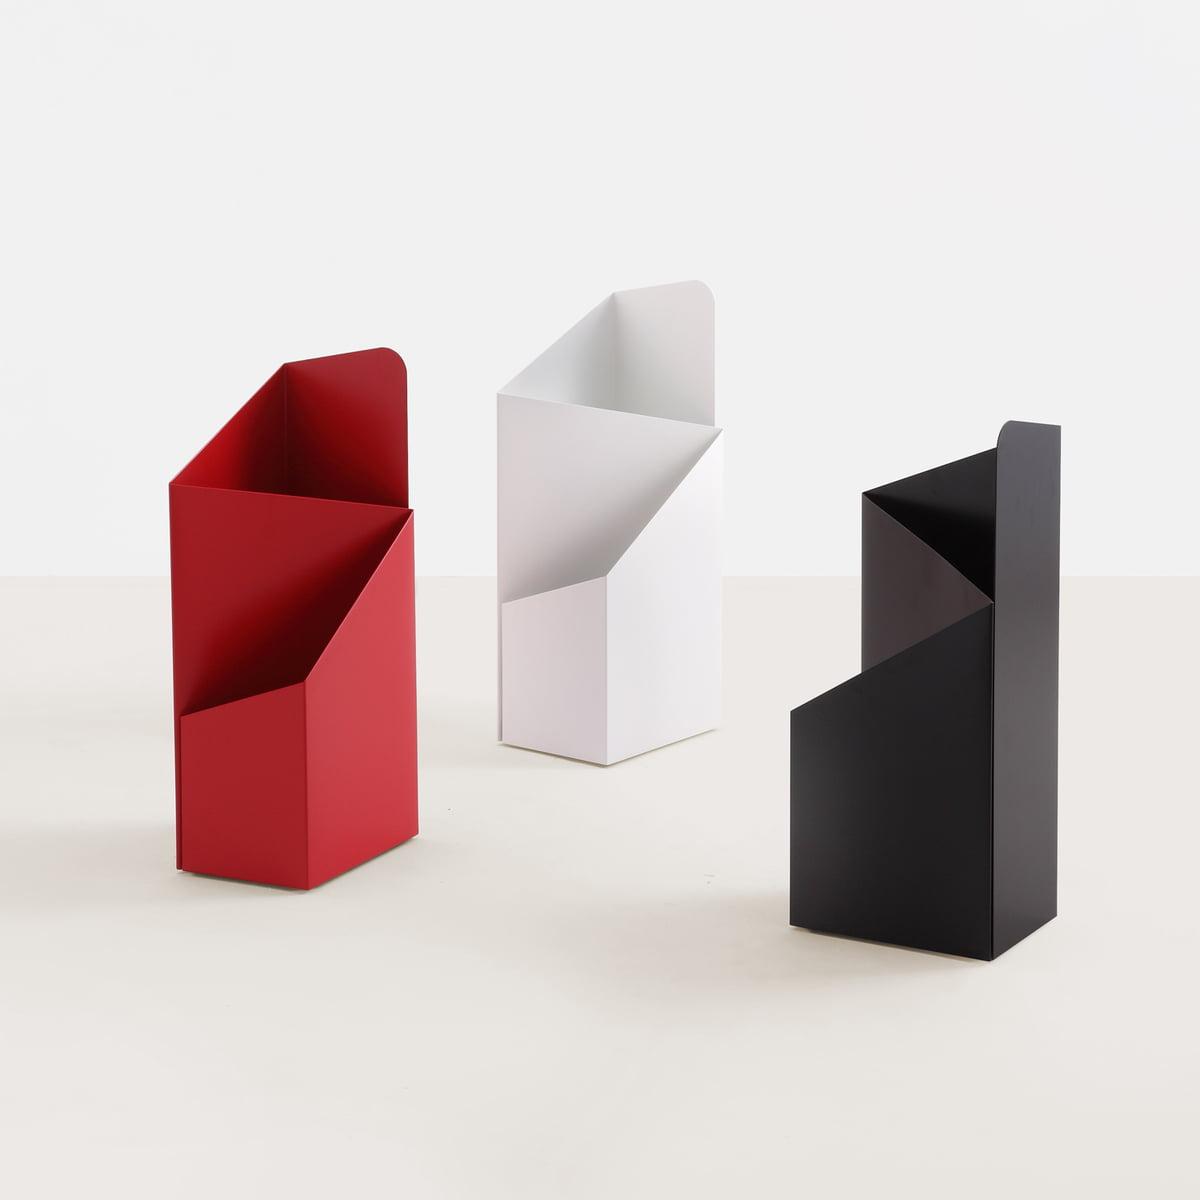 via schirmst nder mox shop. Black Bedroom Furniture Sets. Home Design Ideas